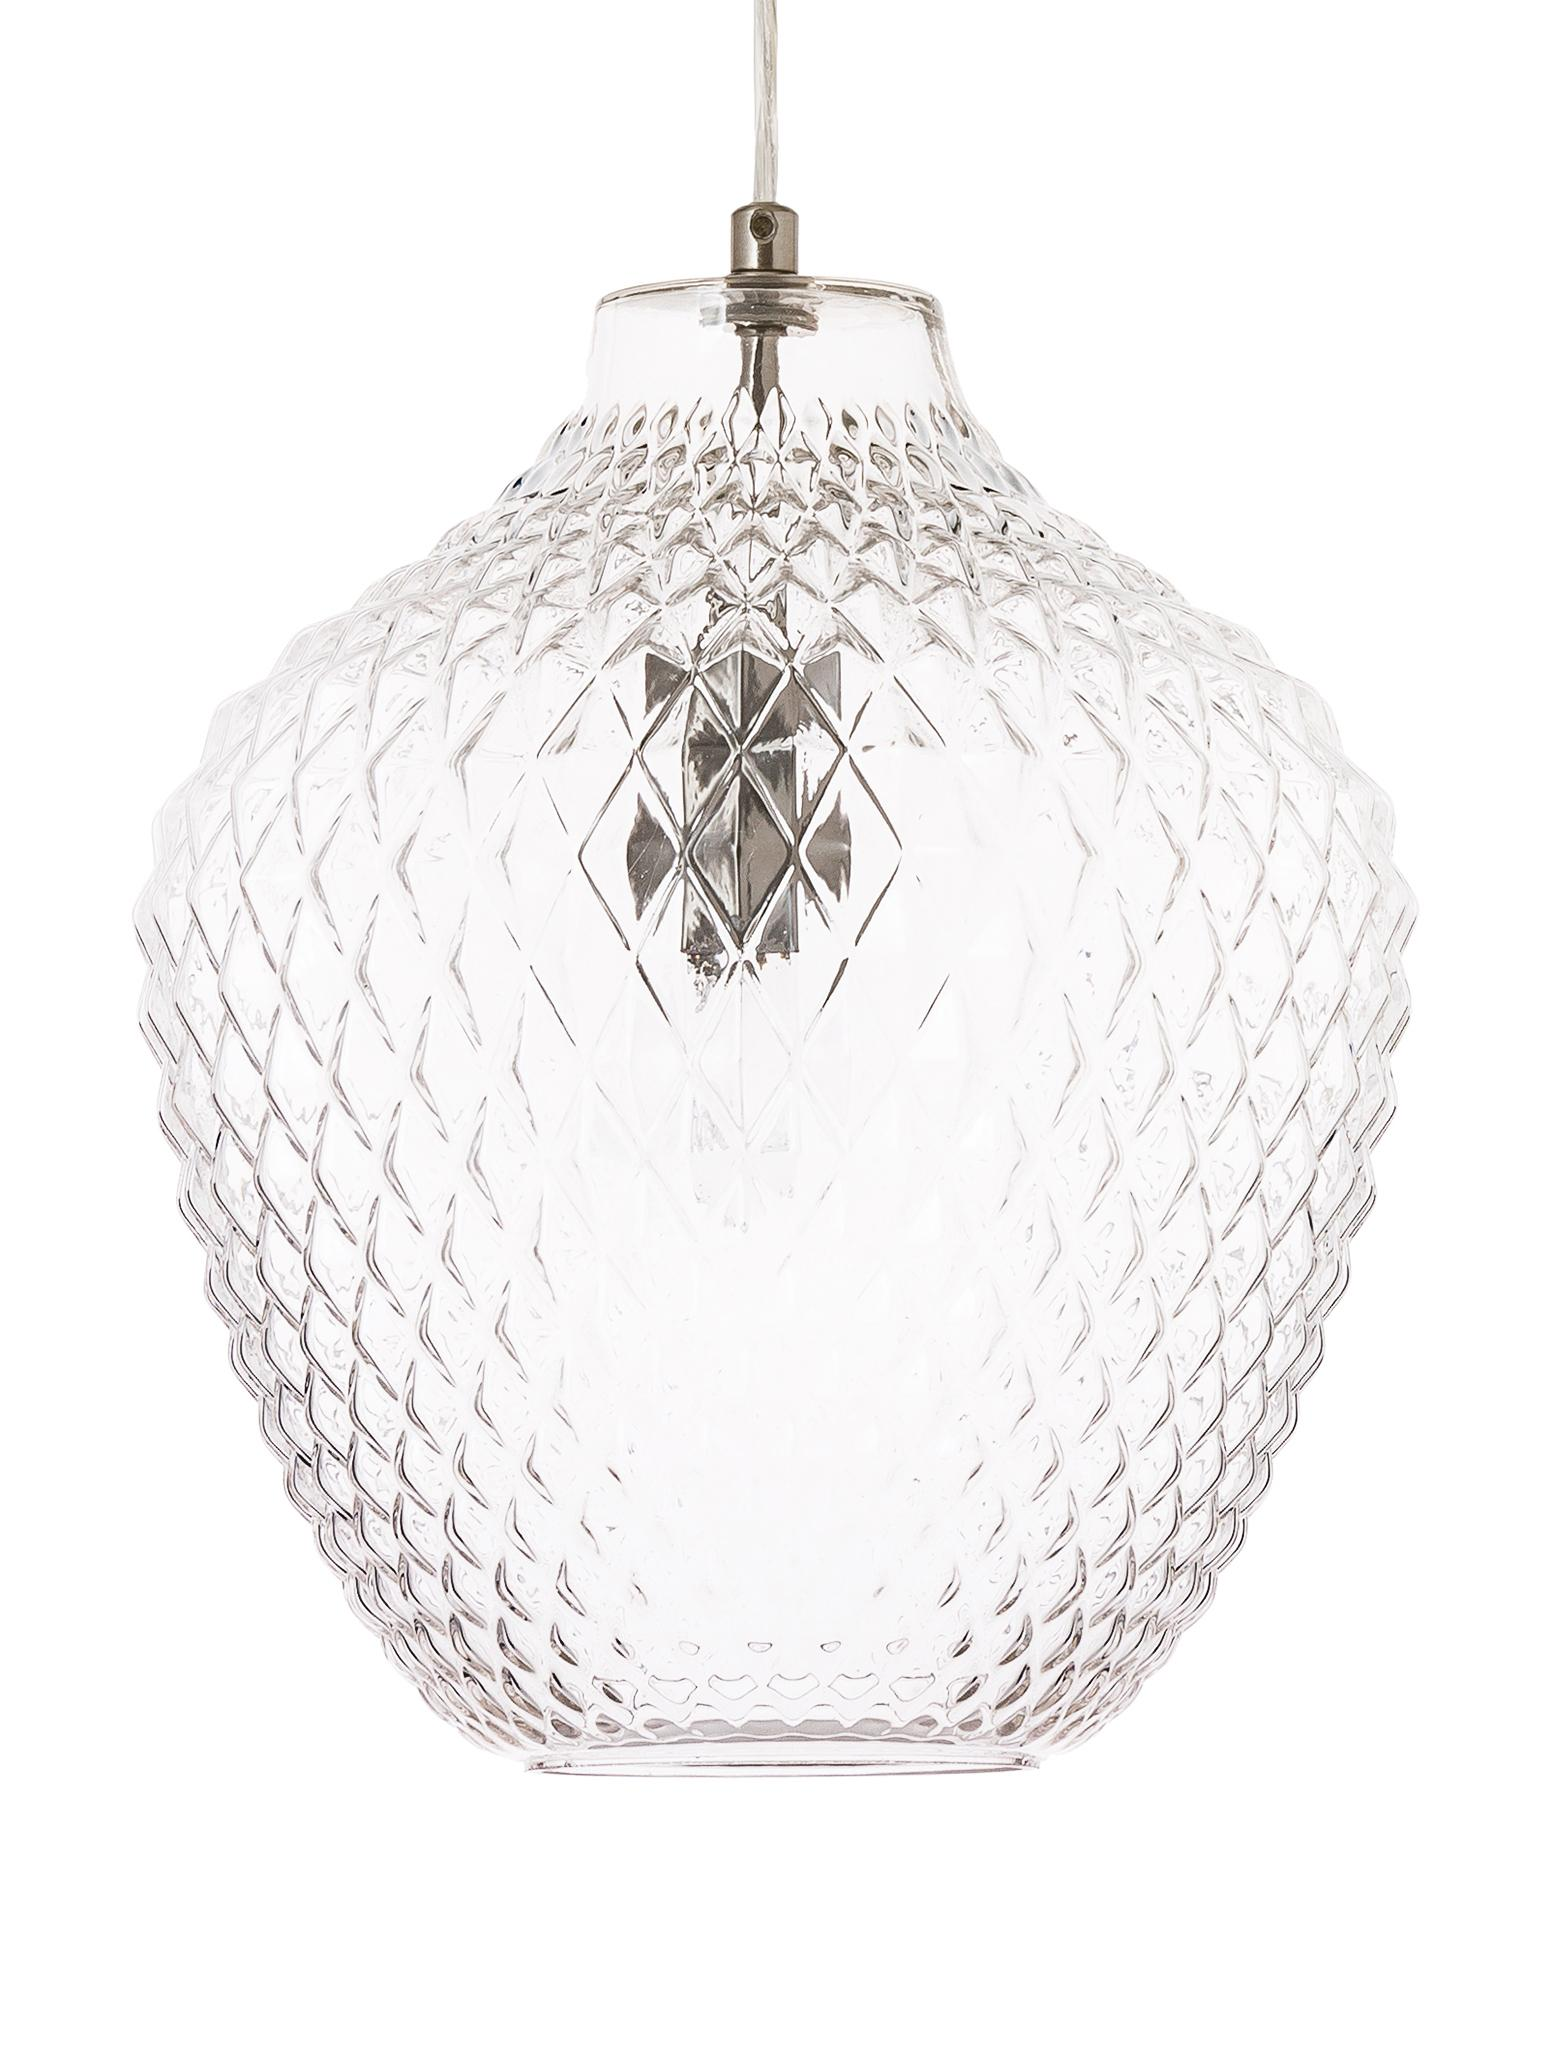 Lampada a sospensione in vetro Lee, Paralume: vetro, Trasparente, cromo, Ø 27 x Alt. 33 cm